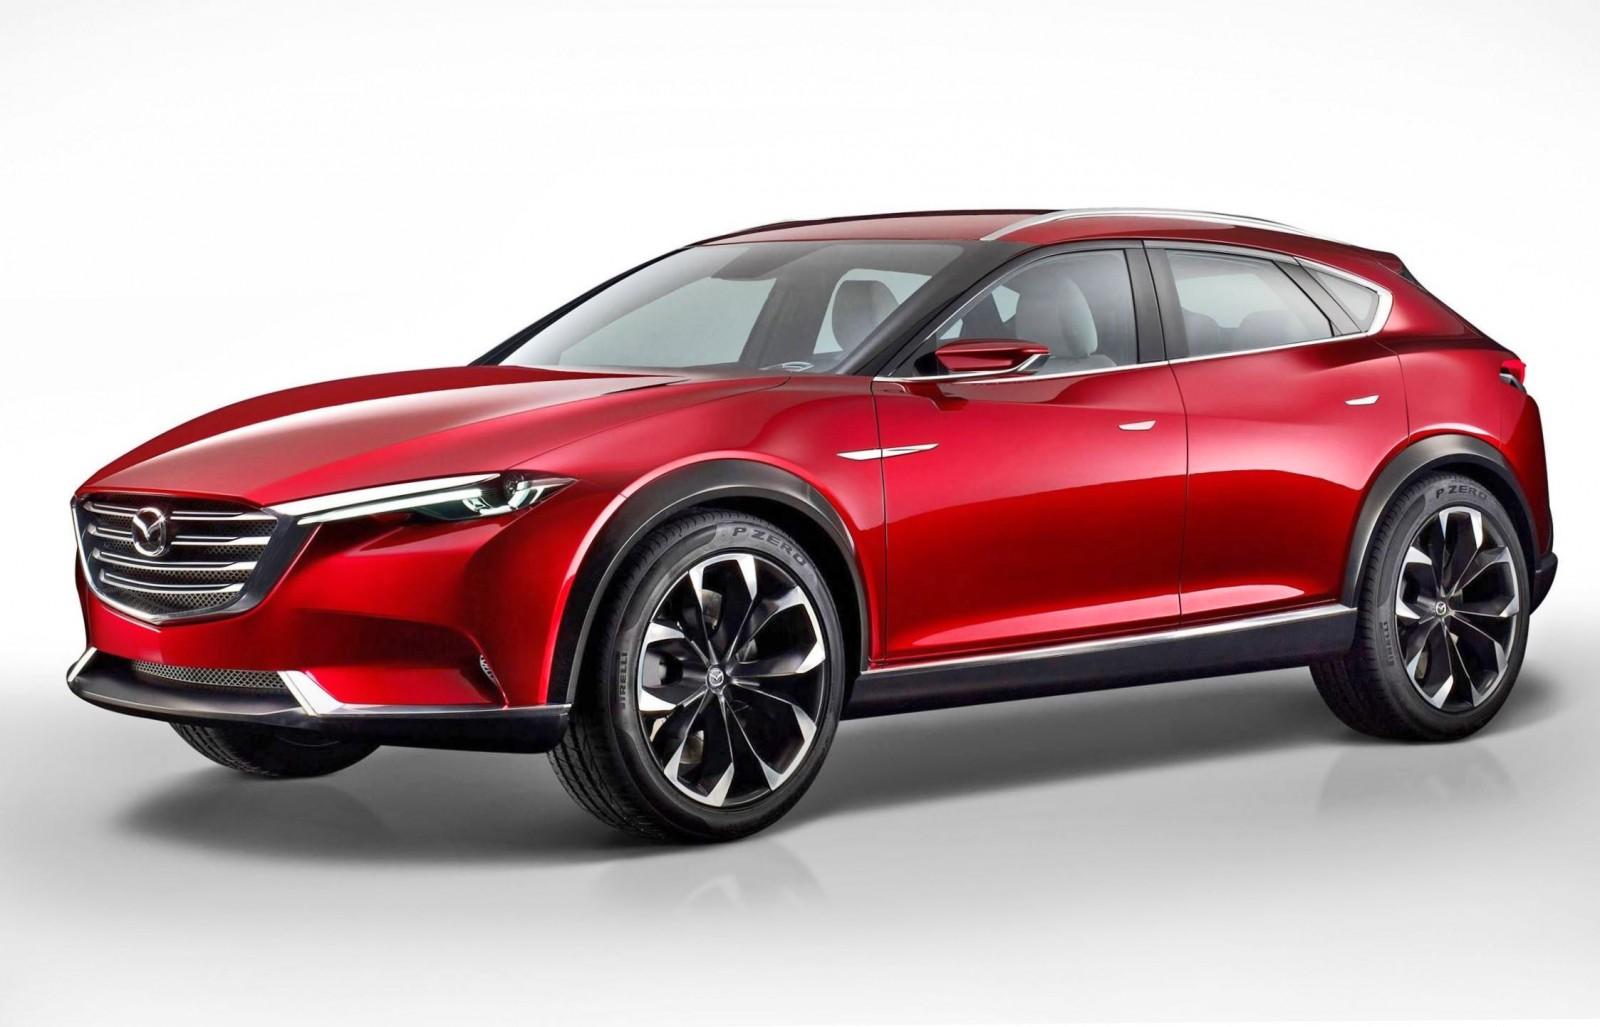 2015 Mazda KOERU Concept - 197.2KB